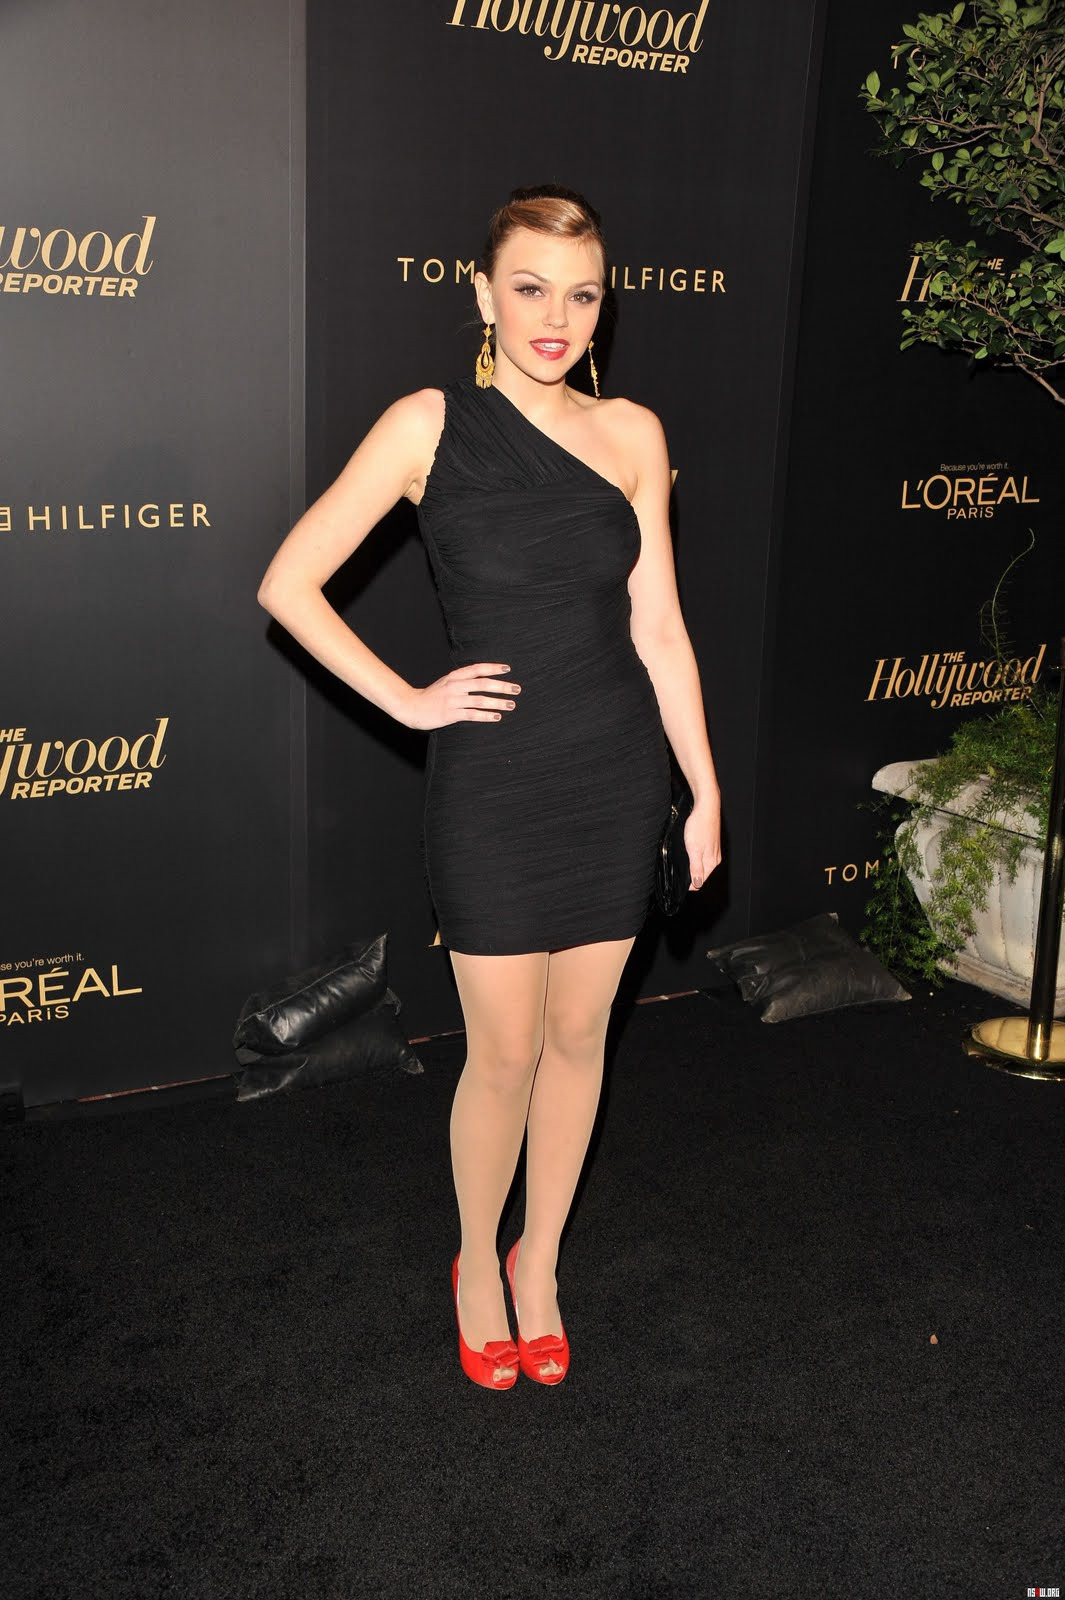 http://4.bp.blogspot.com/-h6LpHhQPEQo/Ts12NKOpjnI/AAAAAAAAHlg/nYpZ2q_Mea4/s1600/Aimee+Teegarden+sexy+legs.jpg